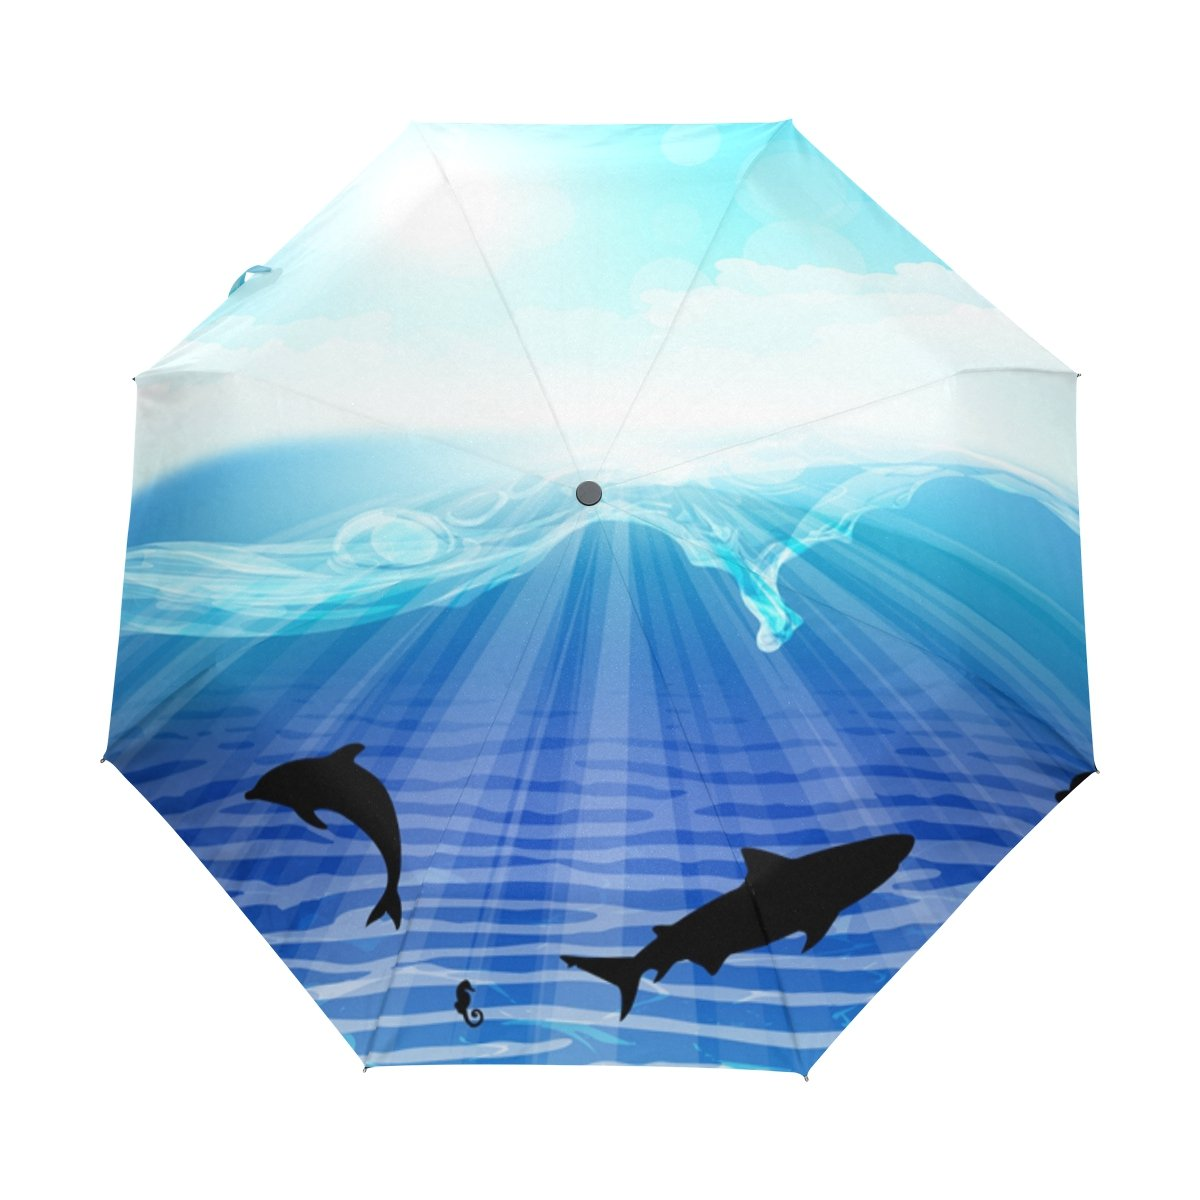 deyya Free Sea Dolphin防風旅行傘自動的に開く閉じる軽量コンパクトゴルフ傘 B075GMWG9N